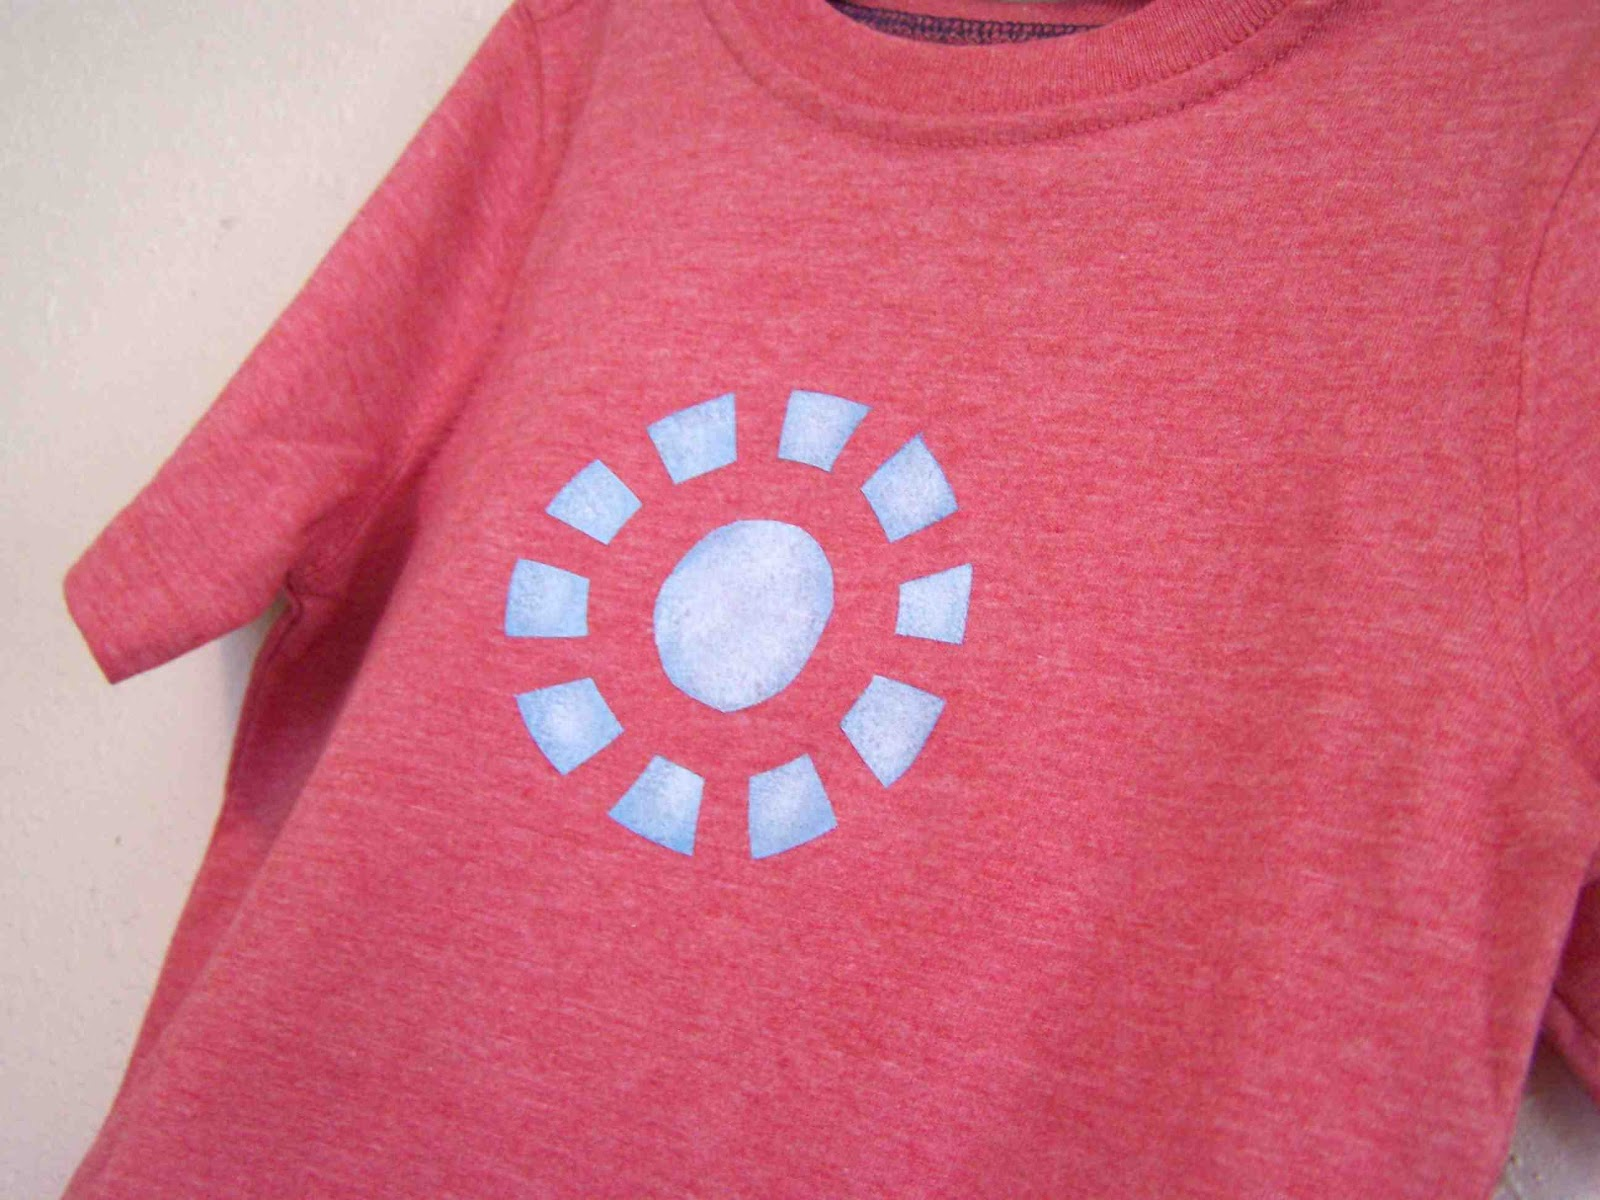 http://3.bp.blogspot.com/-LMRVB6uaM3Y/T7xEhtTajkI/AAAAAAAAEl8/np0ksfEXam4/s1600/iron+man+shirt+2.jpg